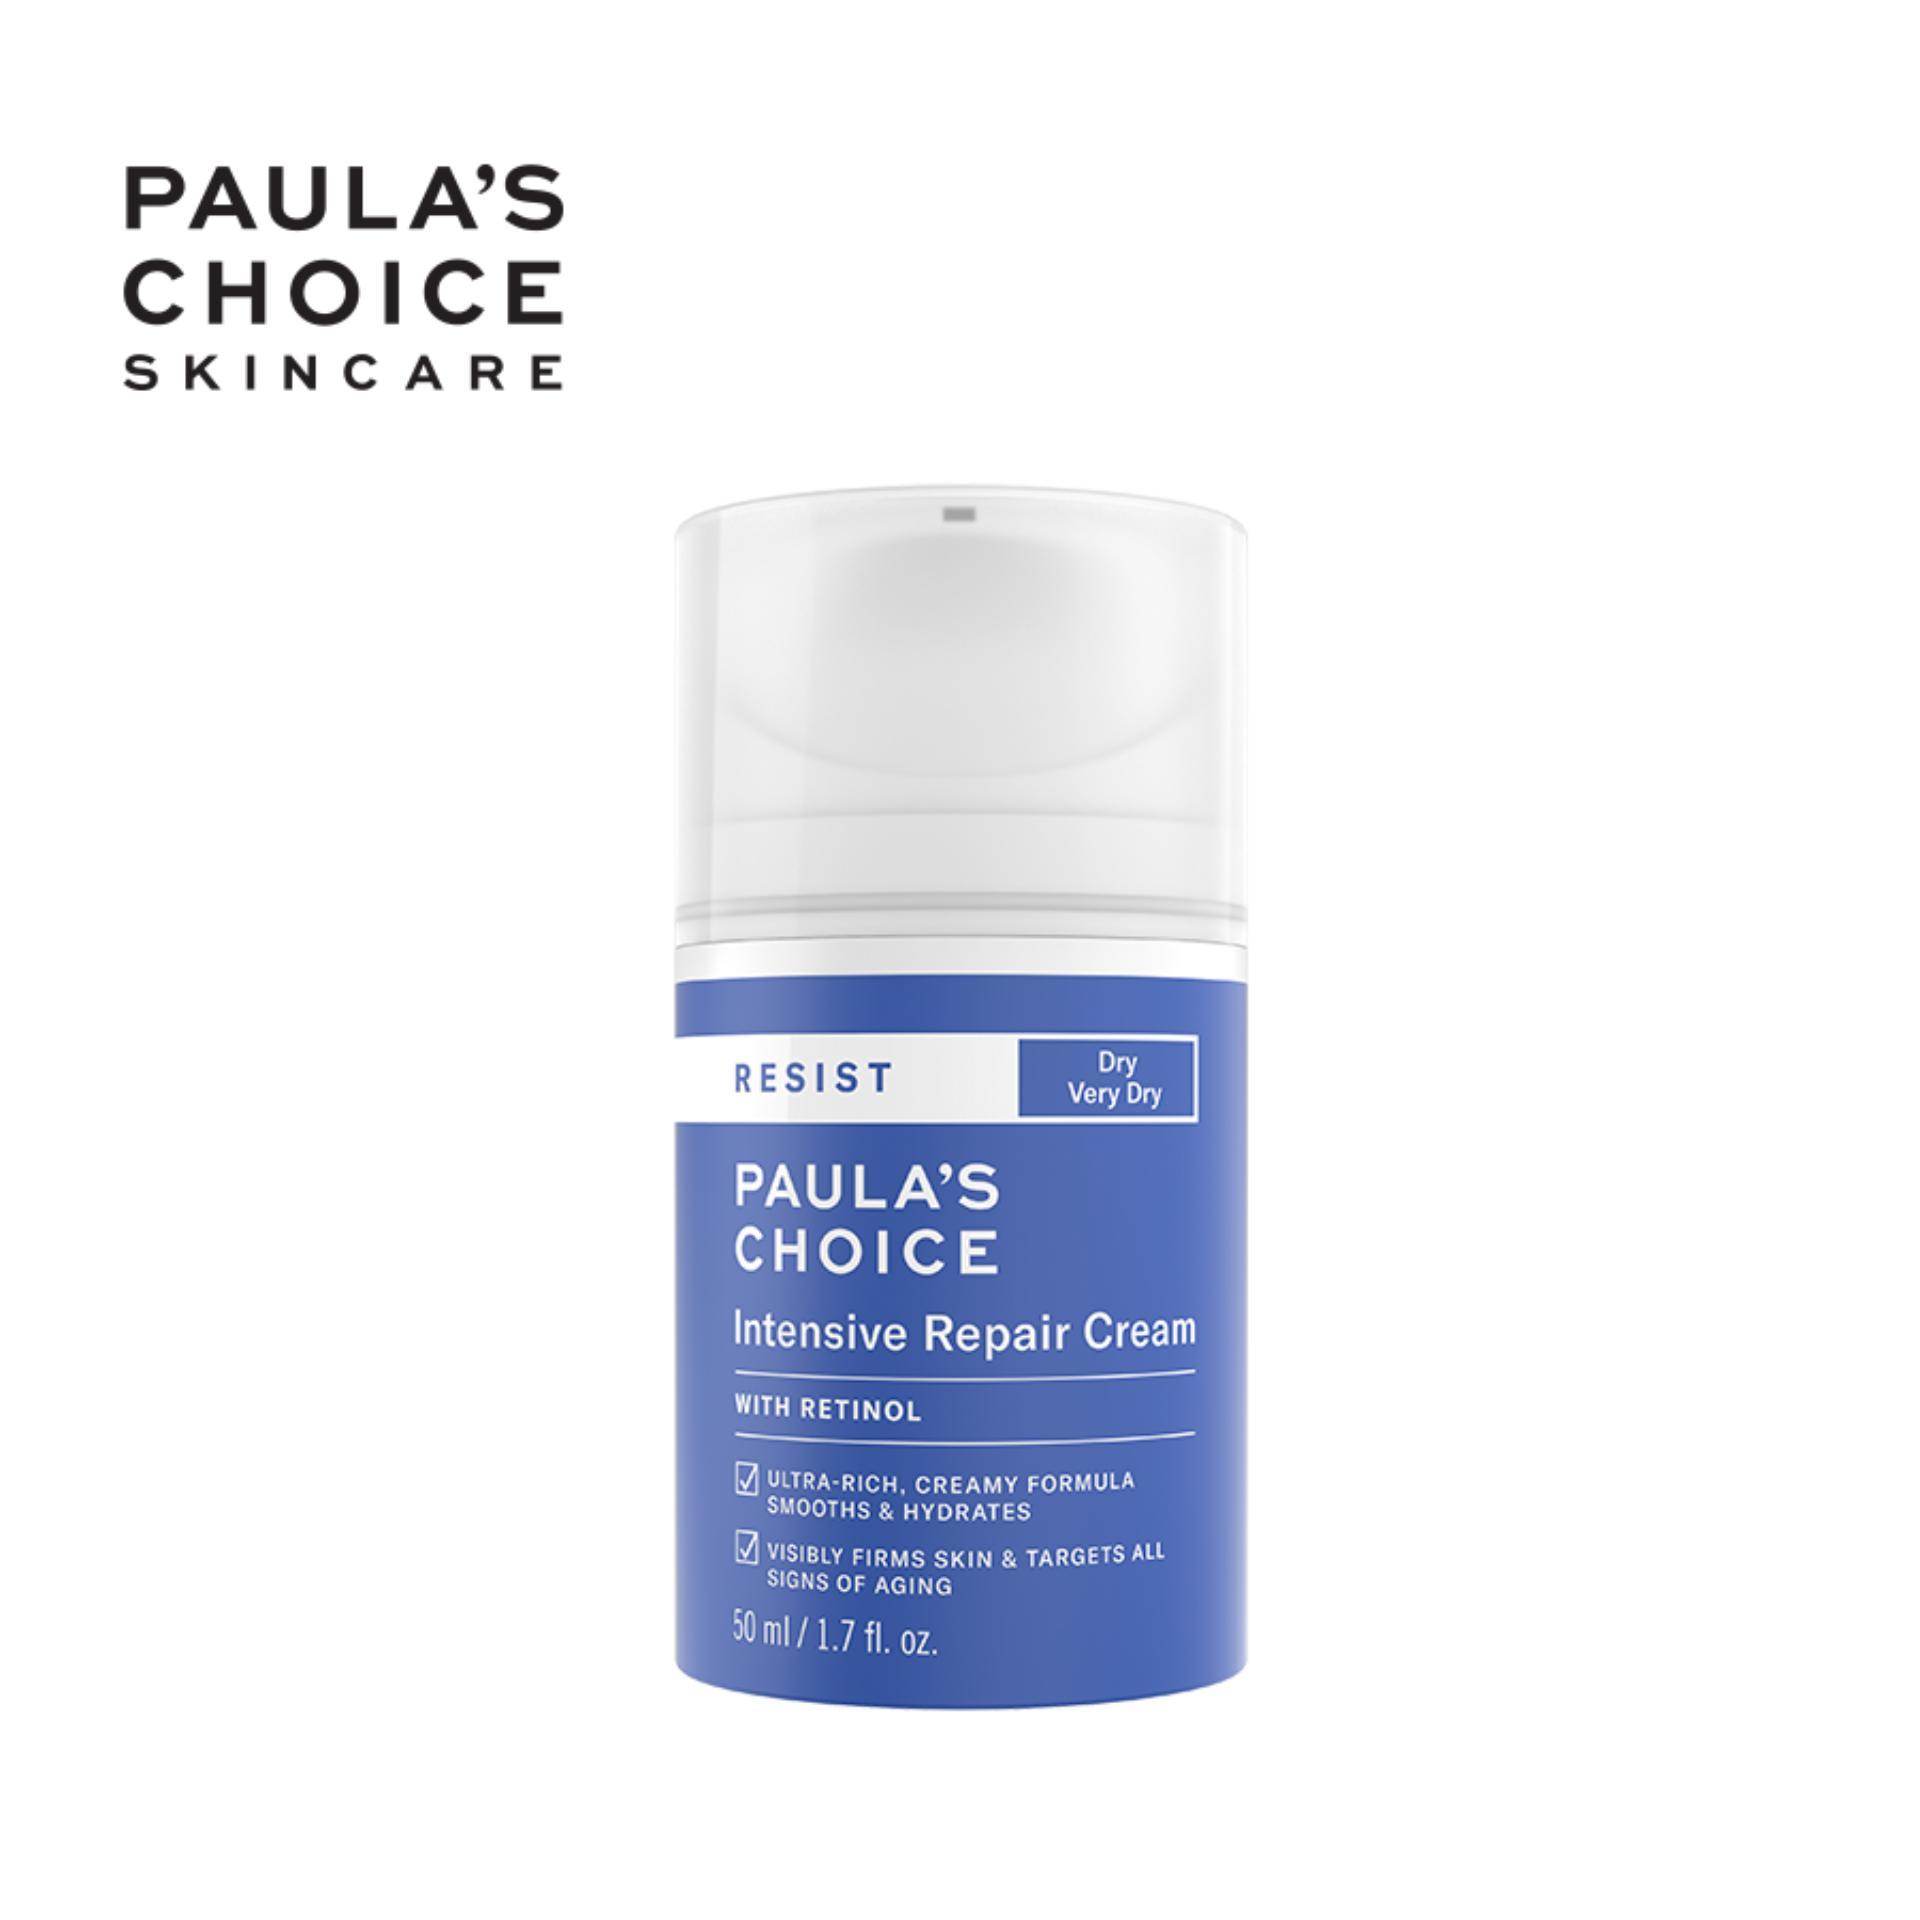 Kem dưỡng ẩm siêu cao cấp chứa Retinol Paula's Choice RESIST Intensive Repair Cream 7810